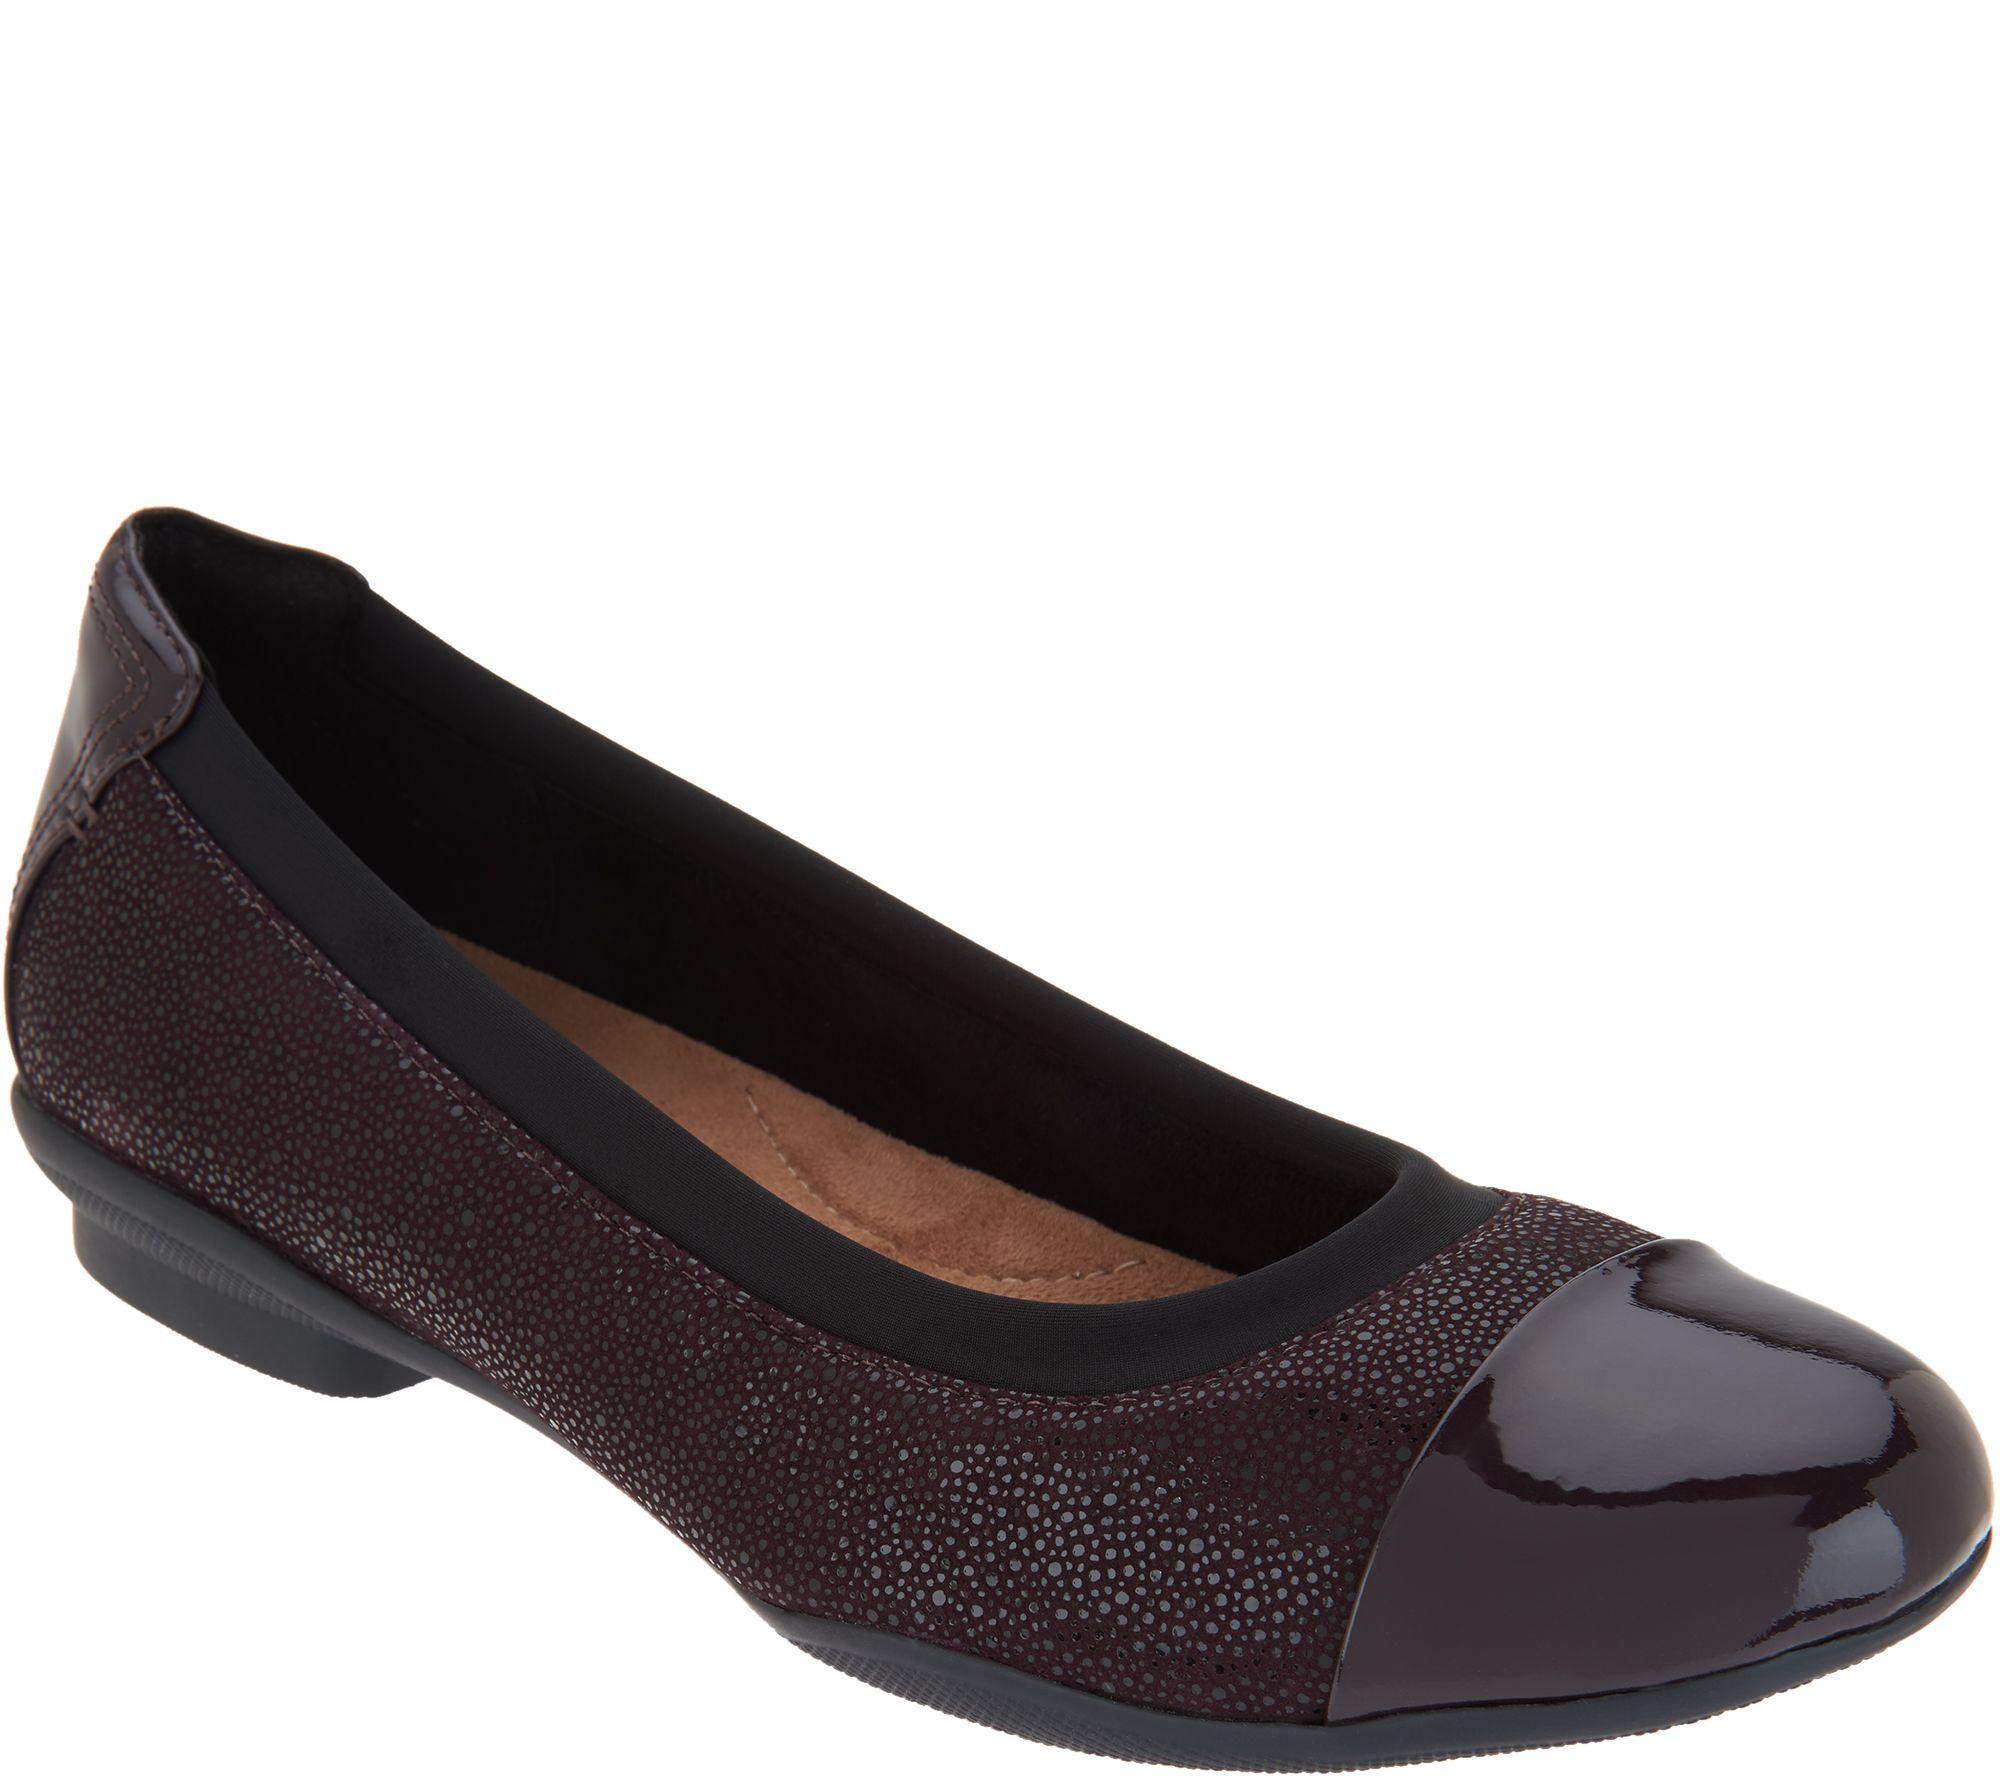 19dd568a948f Clarks Artisan Leather Ballet Flats - Neenah Garden - Page 1 — QVC.com